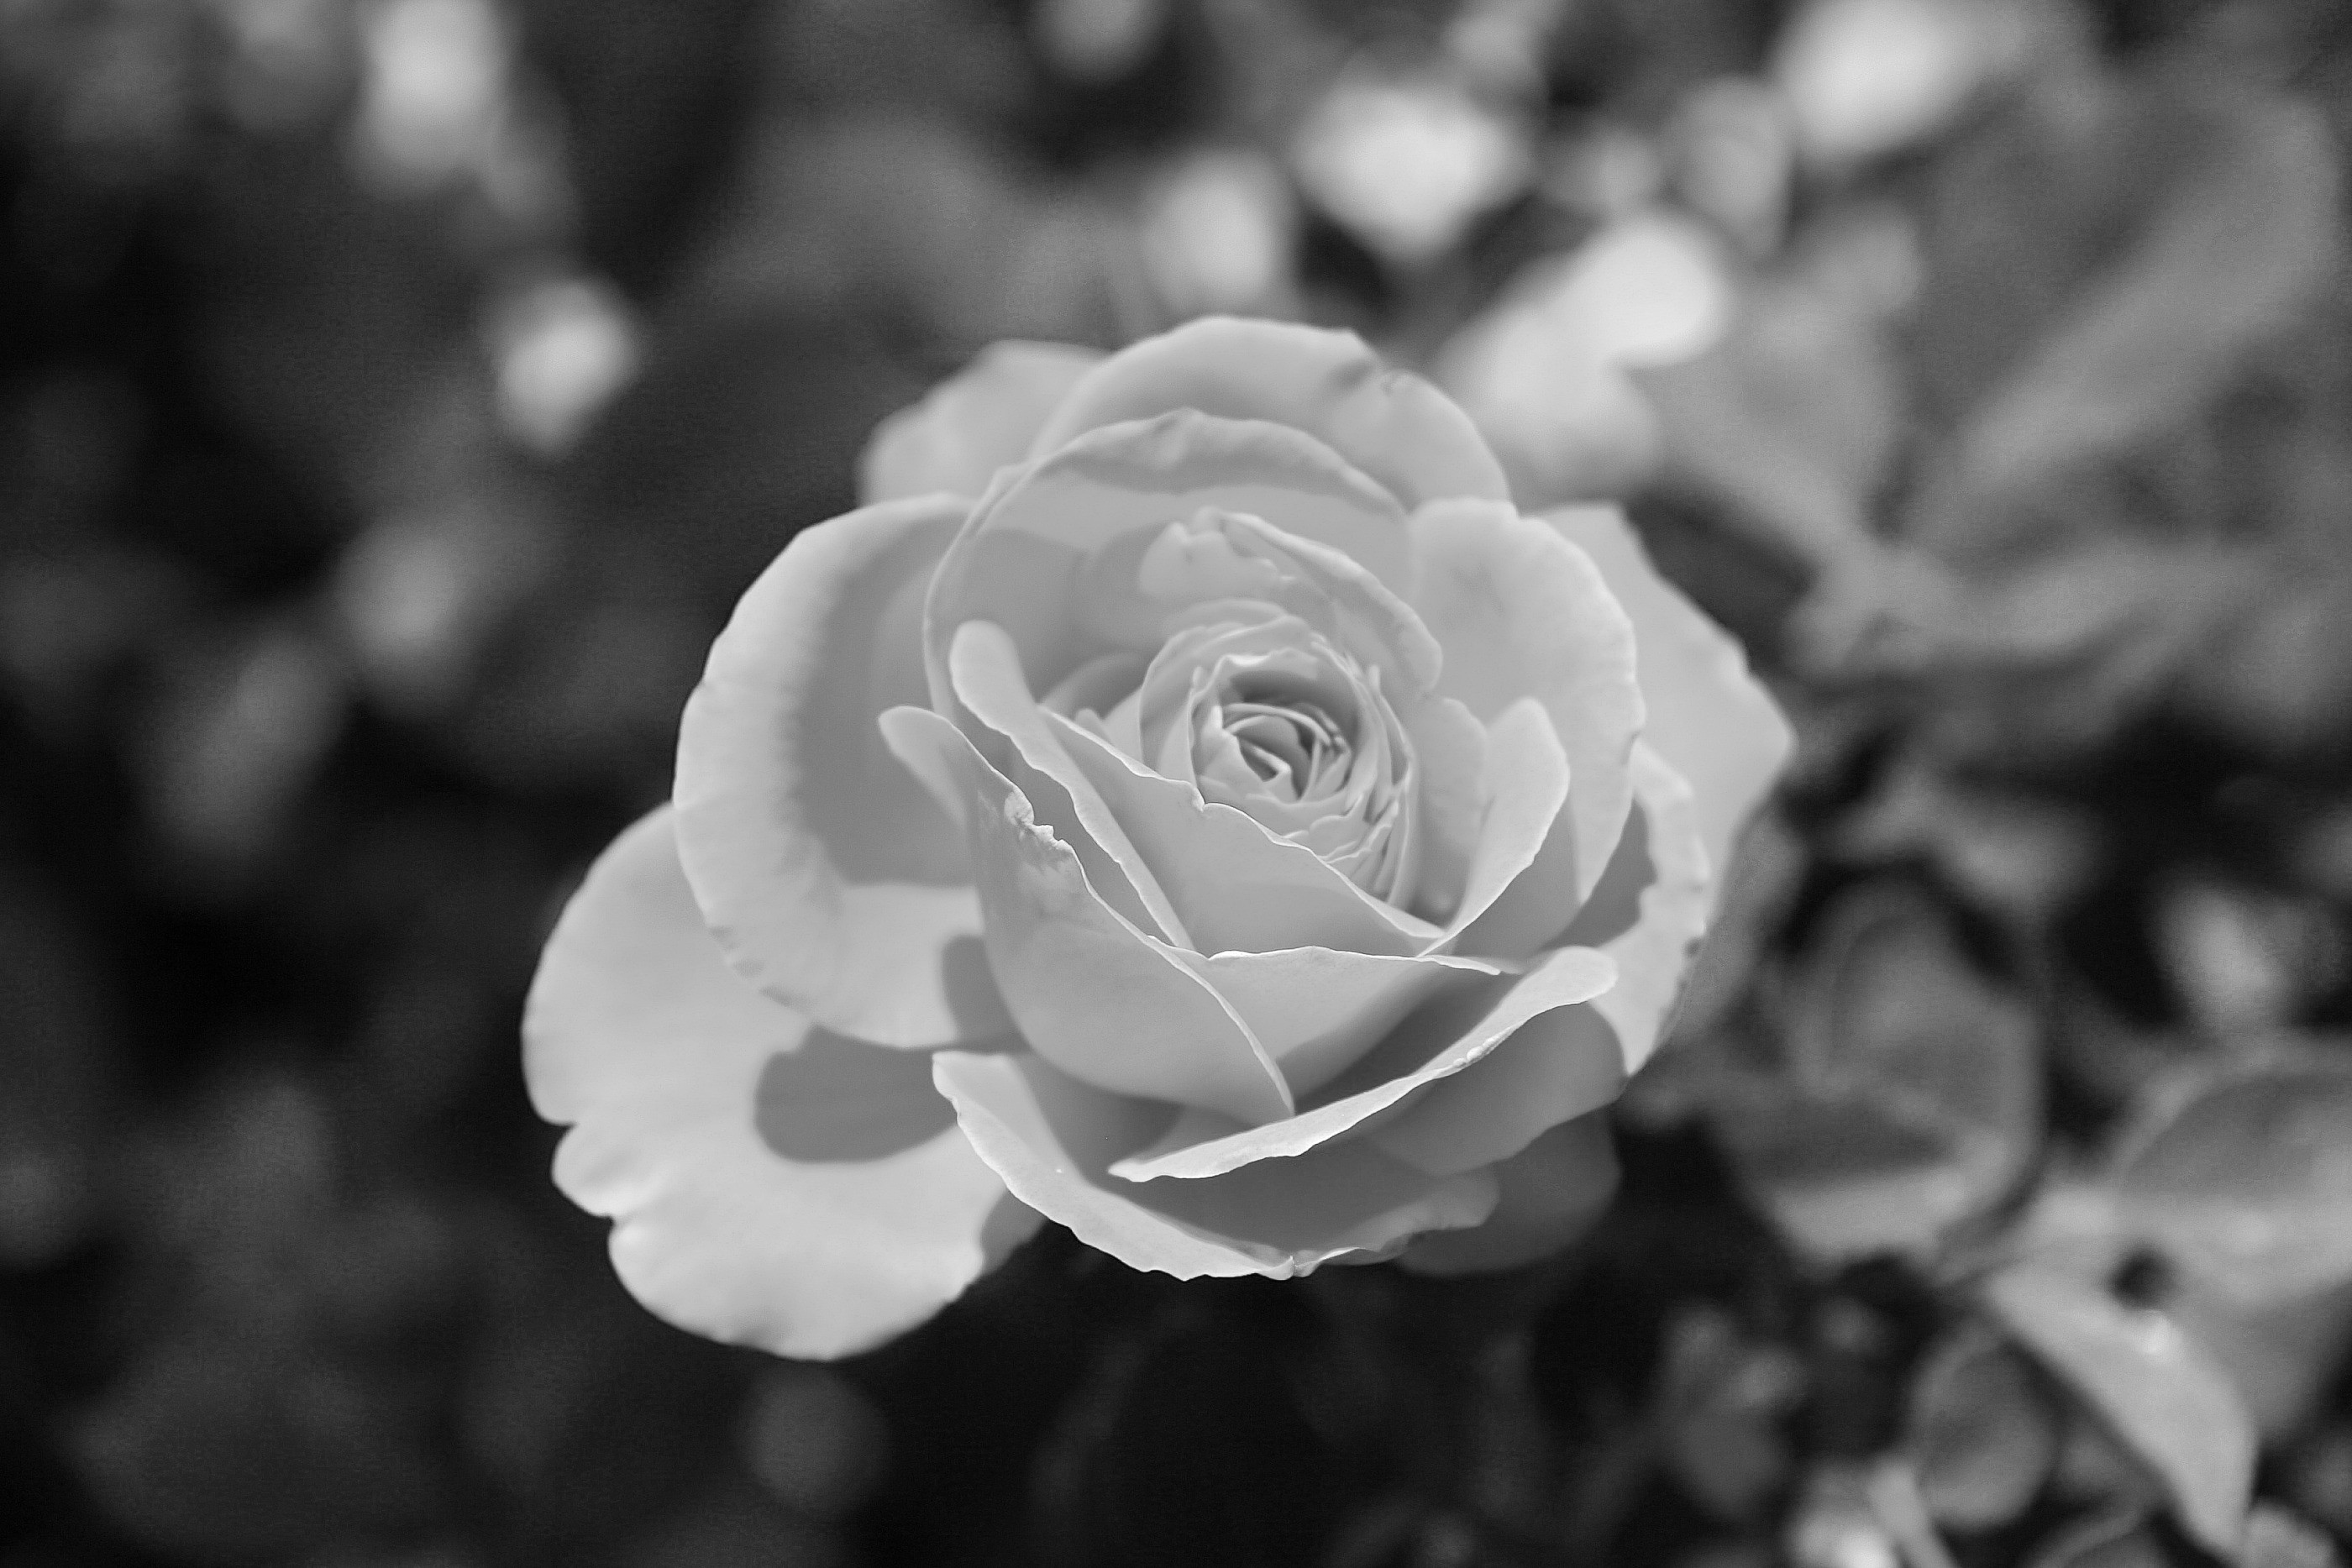 Black And White Rose Wallpaper 2 Free Wallpaper